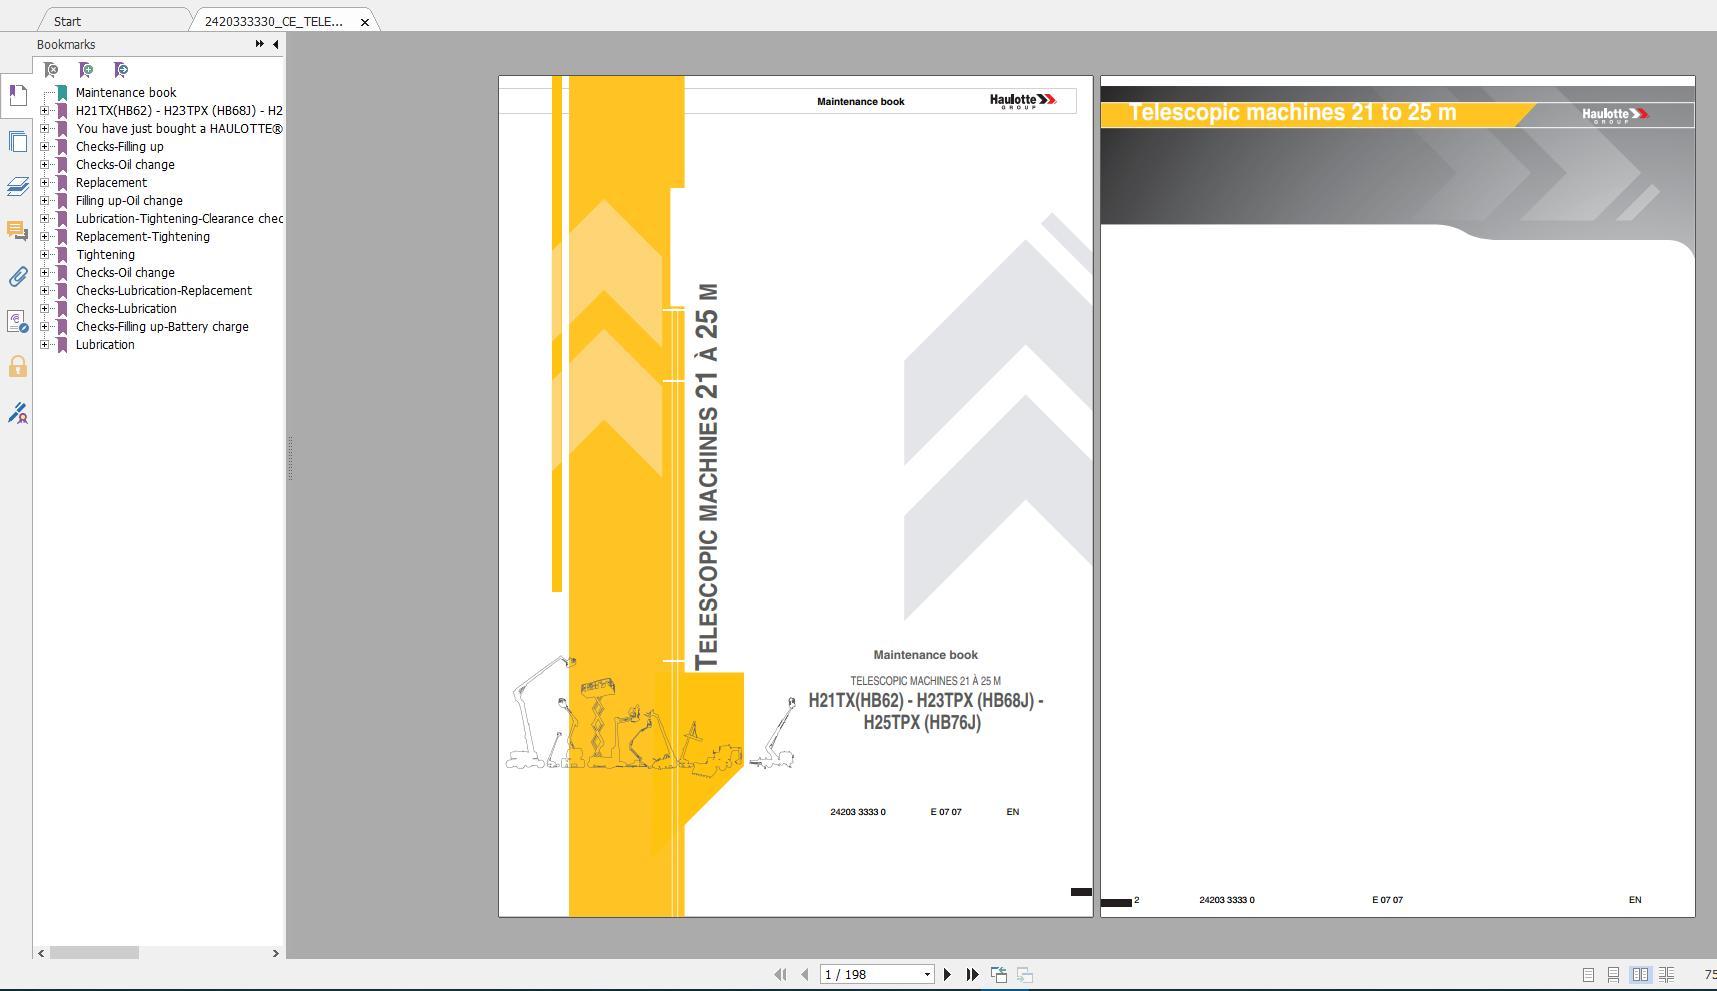 Haulotte_Work_Platforms_and_Telehandlers_Service_Maintenance_Operators_Manual_Training_Spare_Parts_Manual_DVD6